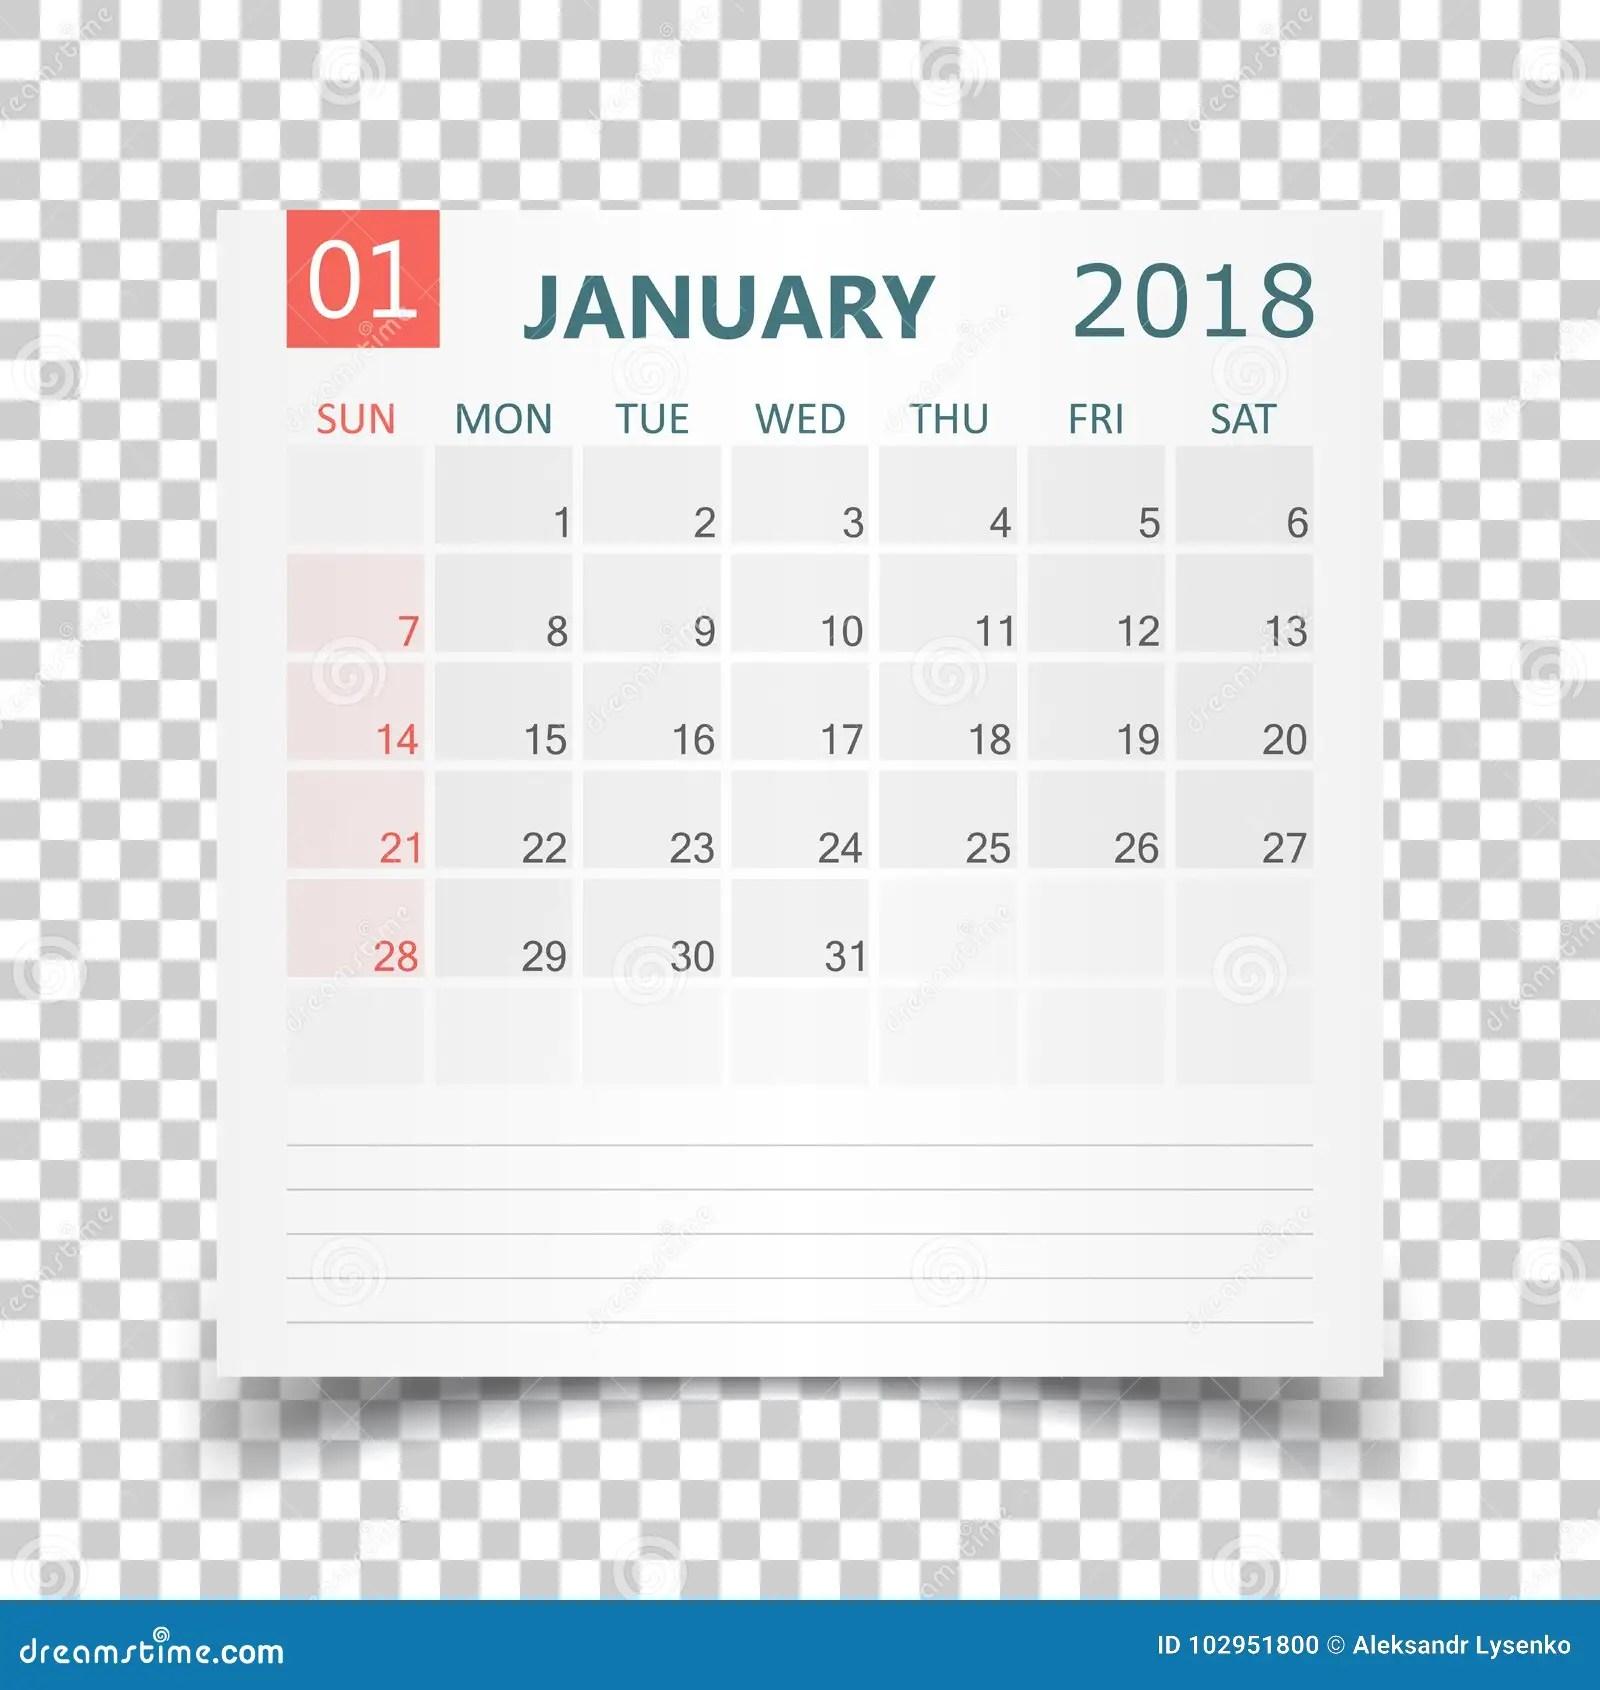 January 2018 Calendar. Calendar Sticker Design Template